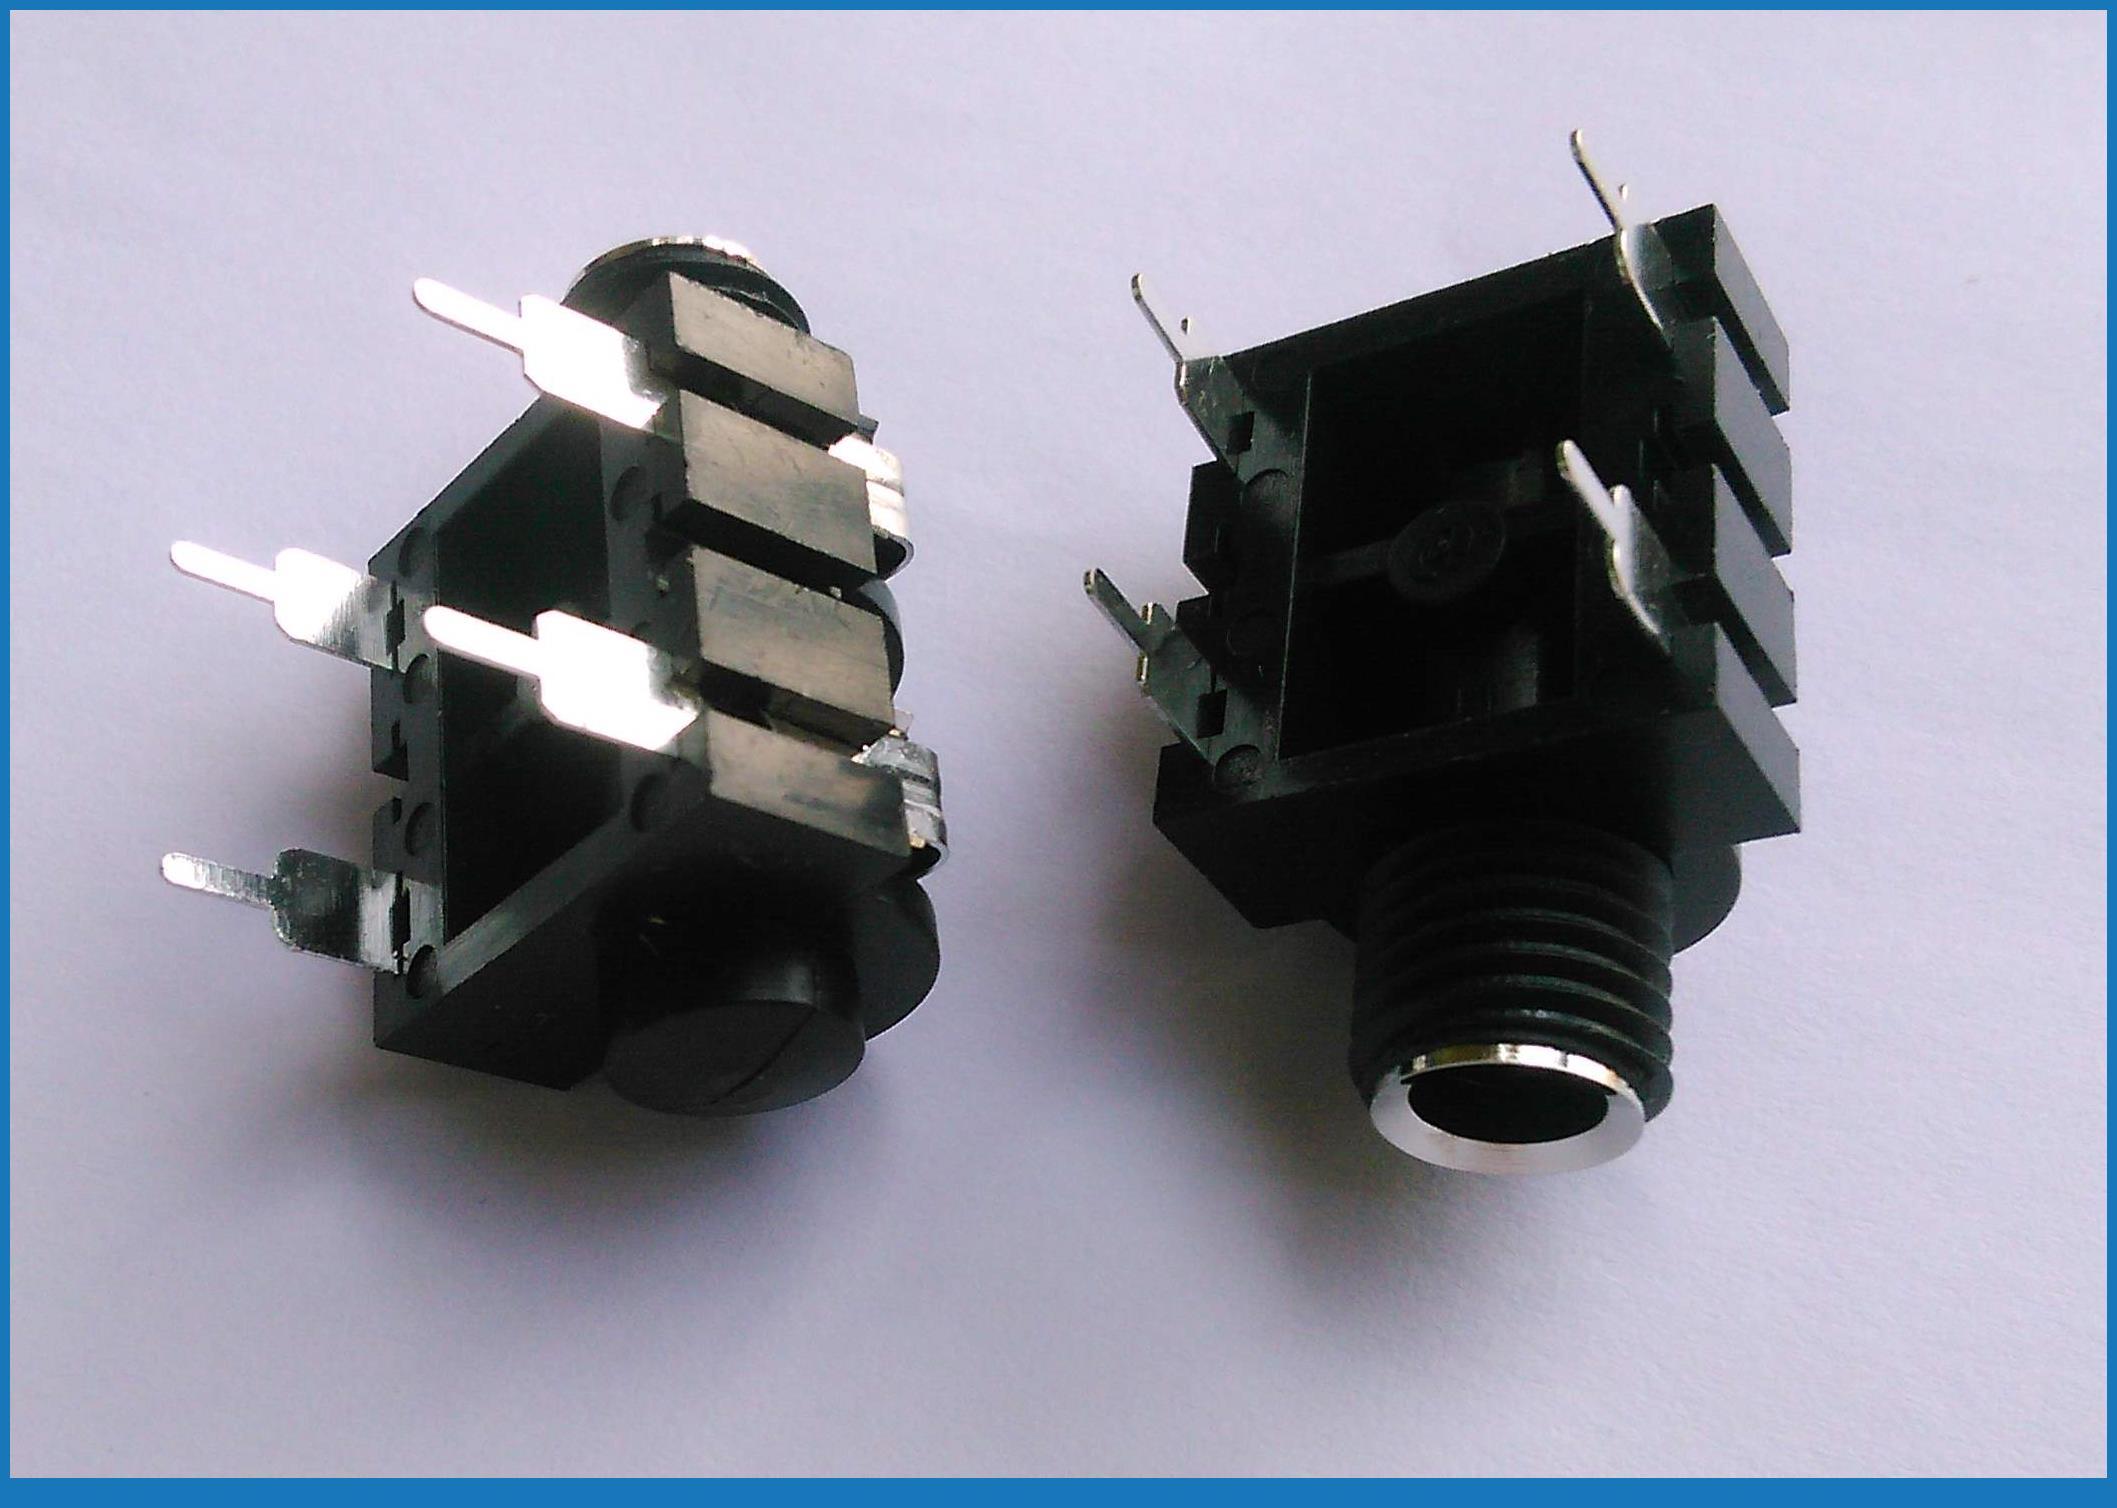 10pcs 6 35mm mono headphone jack microphone 1 4 panel wiring socket amplifiers 1 4 6 35mm mono jack socket panel in connectors from lights lighting on  [ 2117 x 1508 Pixel ]